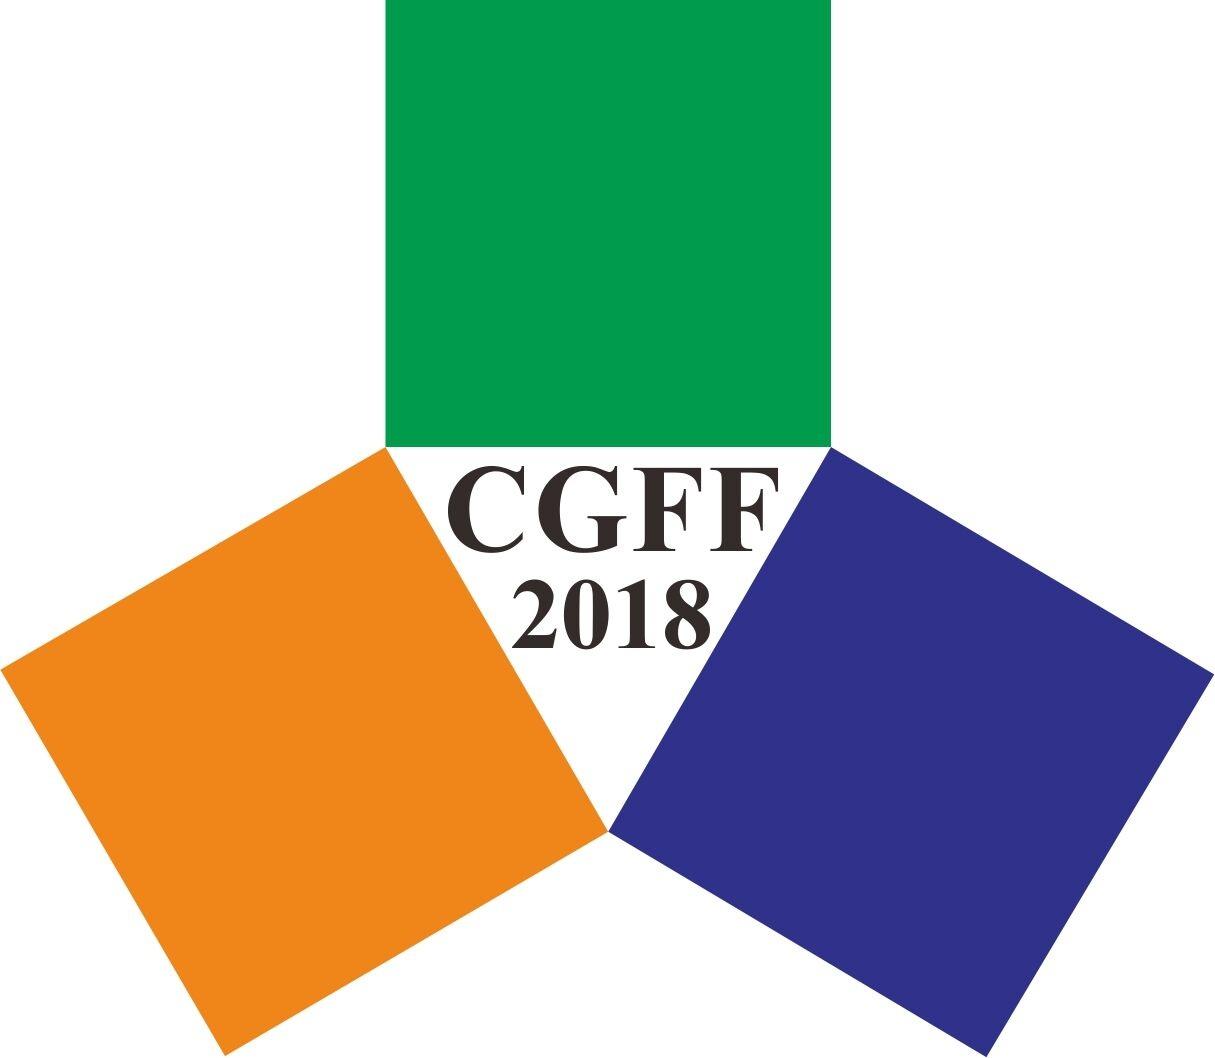 China Guangzhou International Floor Fair 2018 (CGFF 2018)